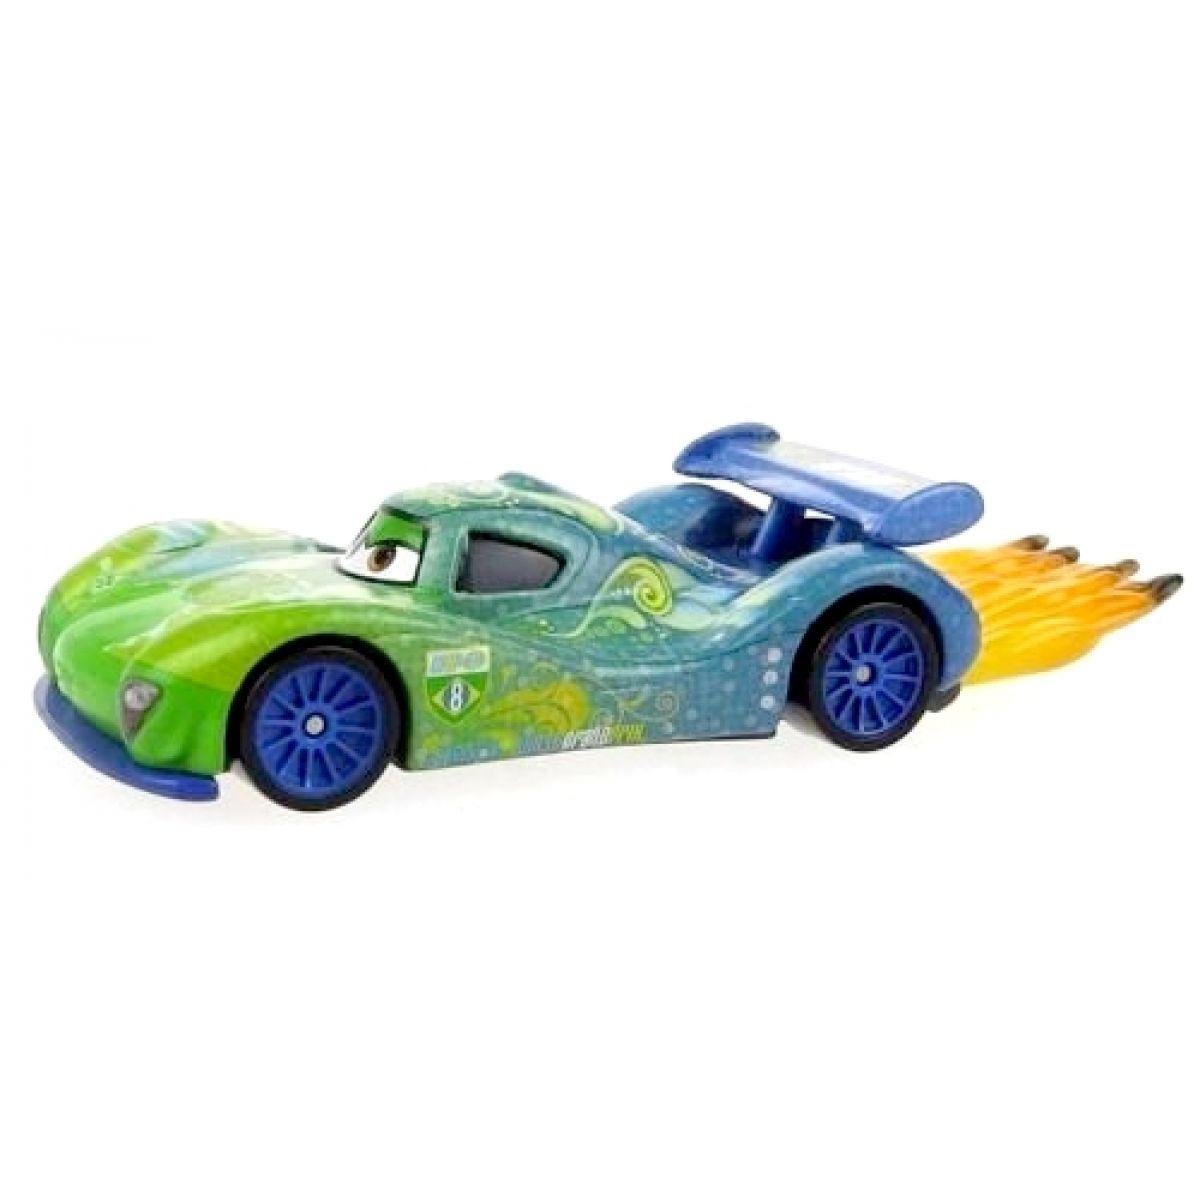 Mattel Cars Auta - Carla Veloso with flames